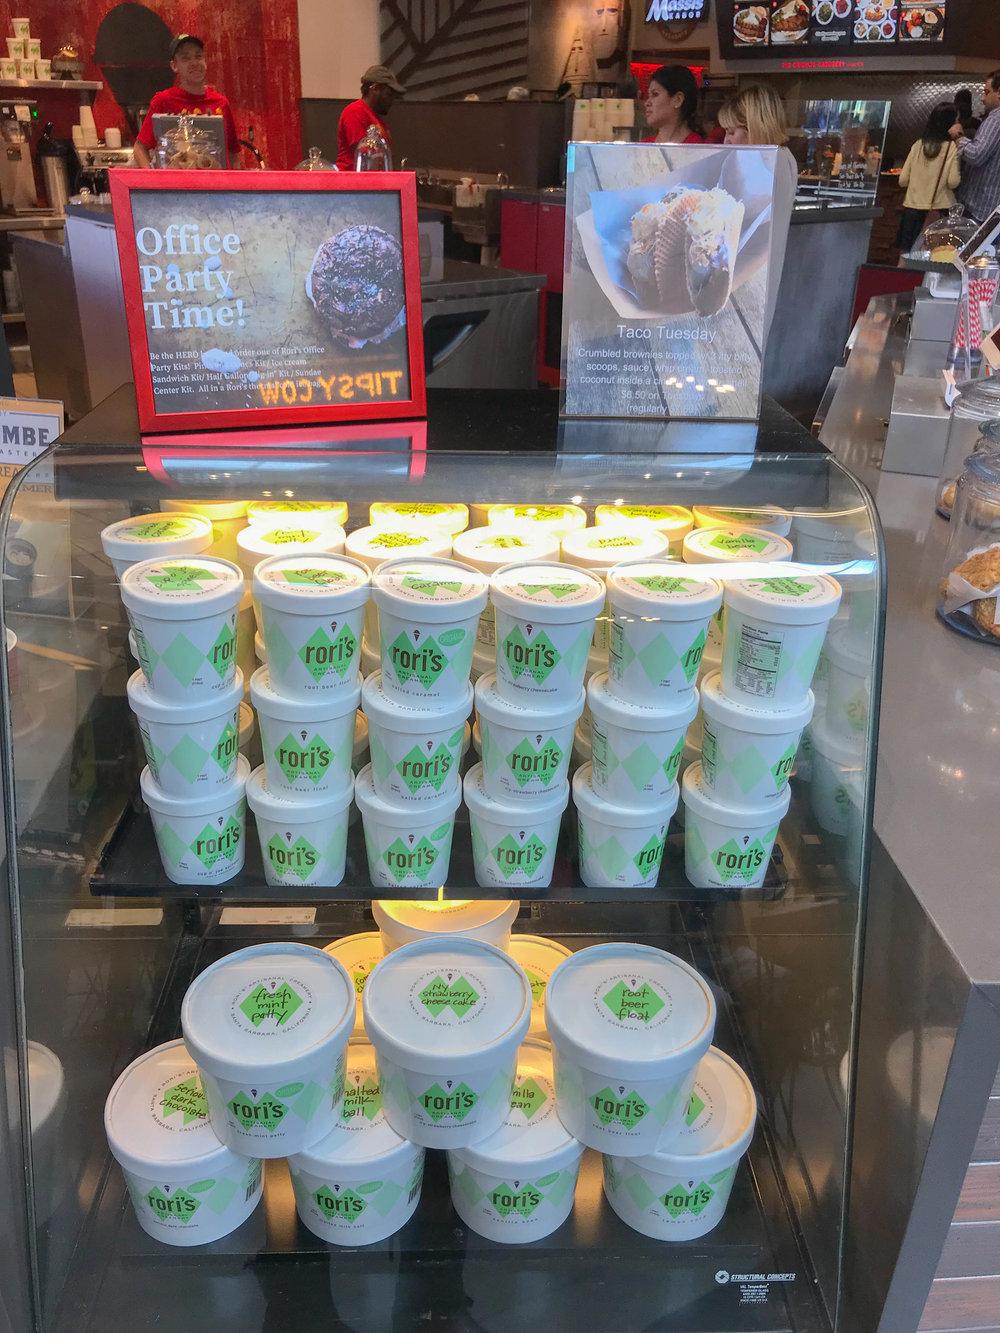 Rori's Artisanal Creamery ice cream pints